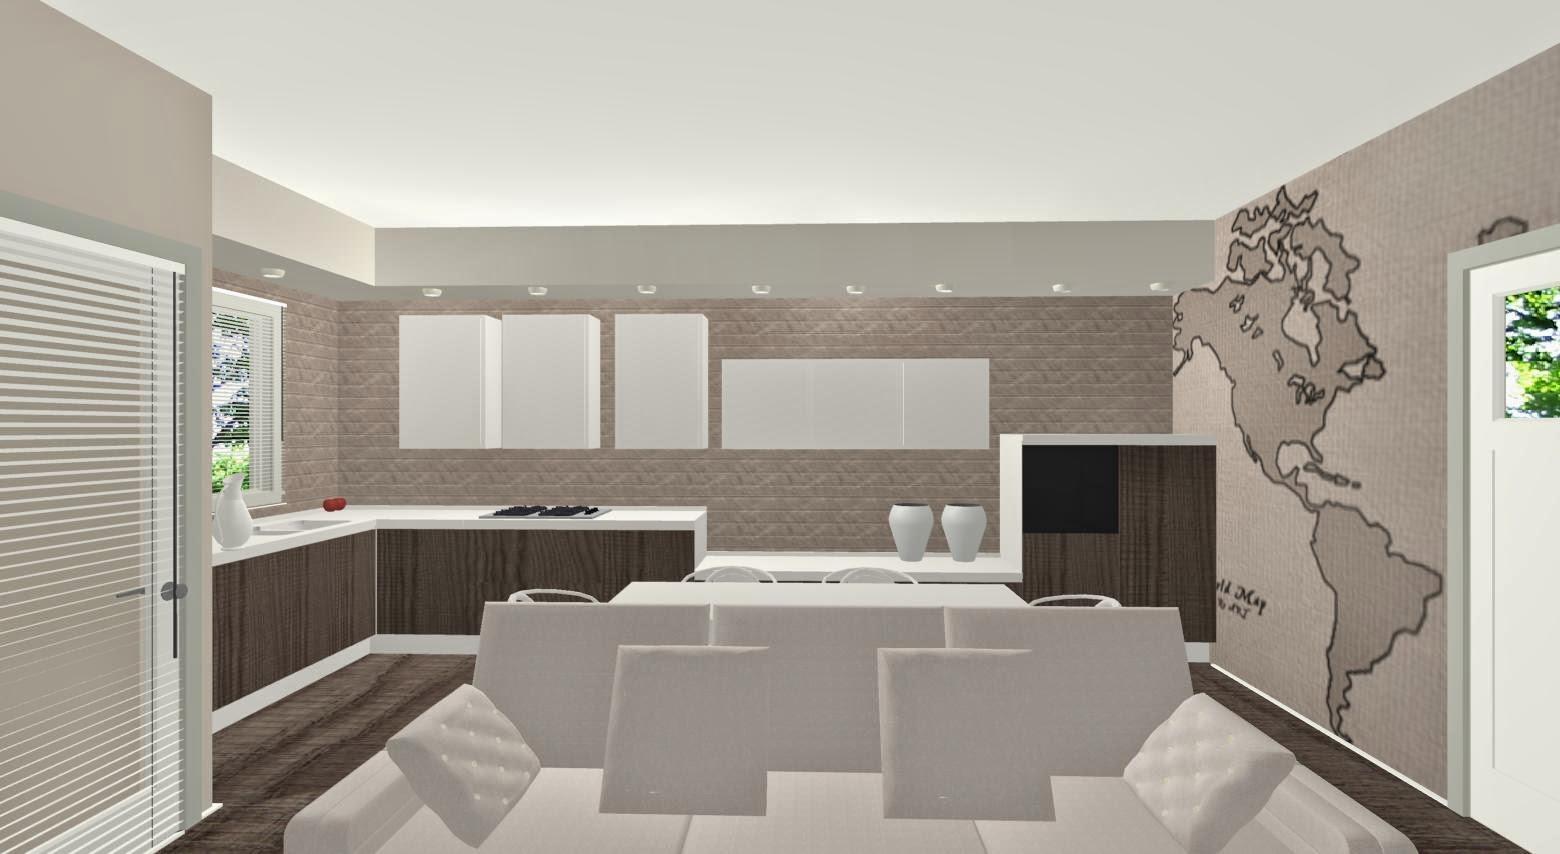 arredare un ambiente unico - Arredare Ambiente Unico Cucina Soggiorno